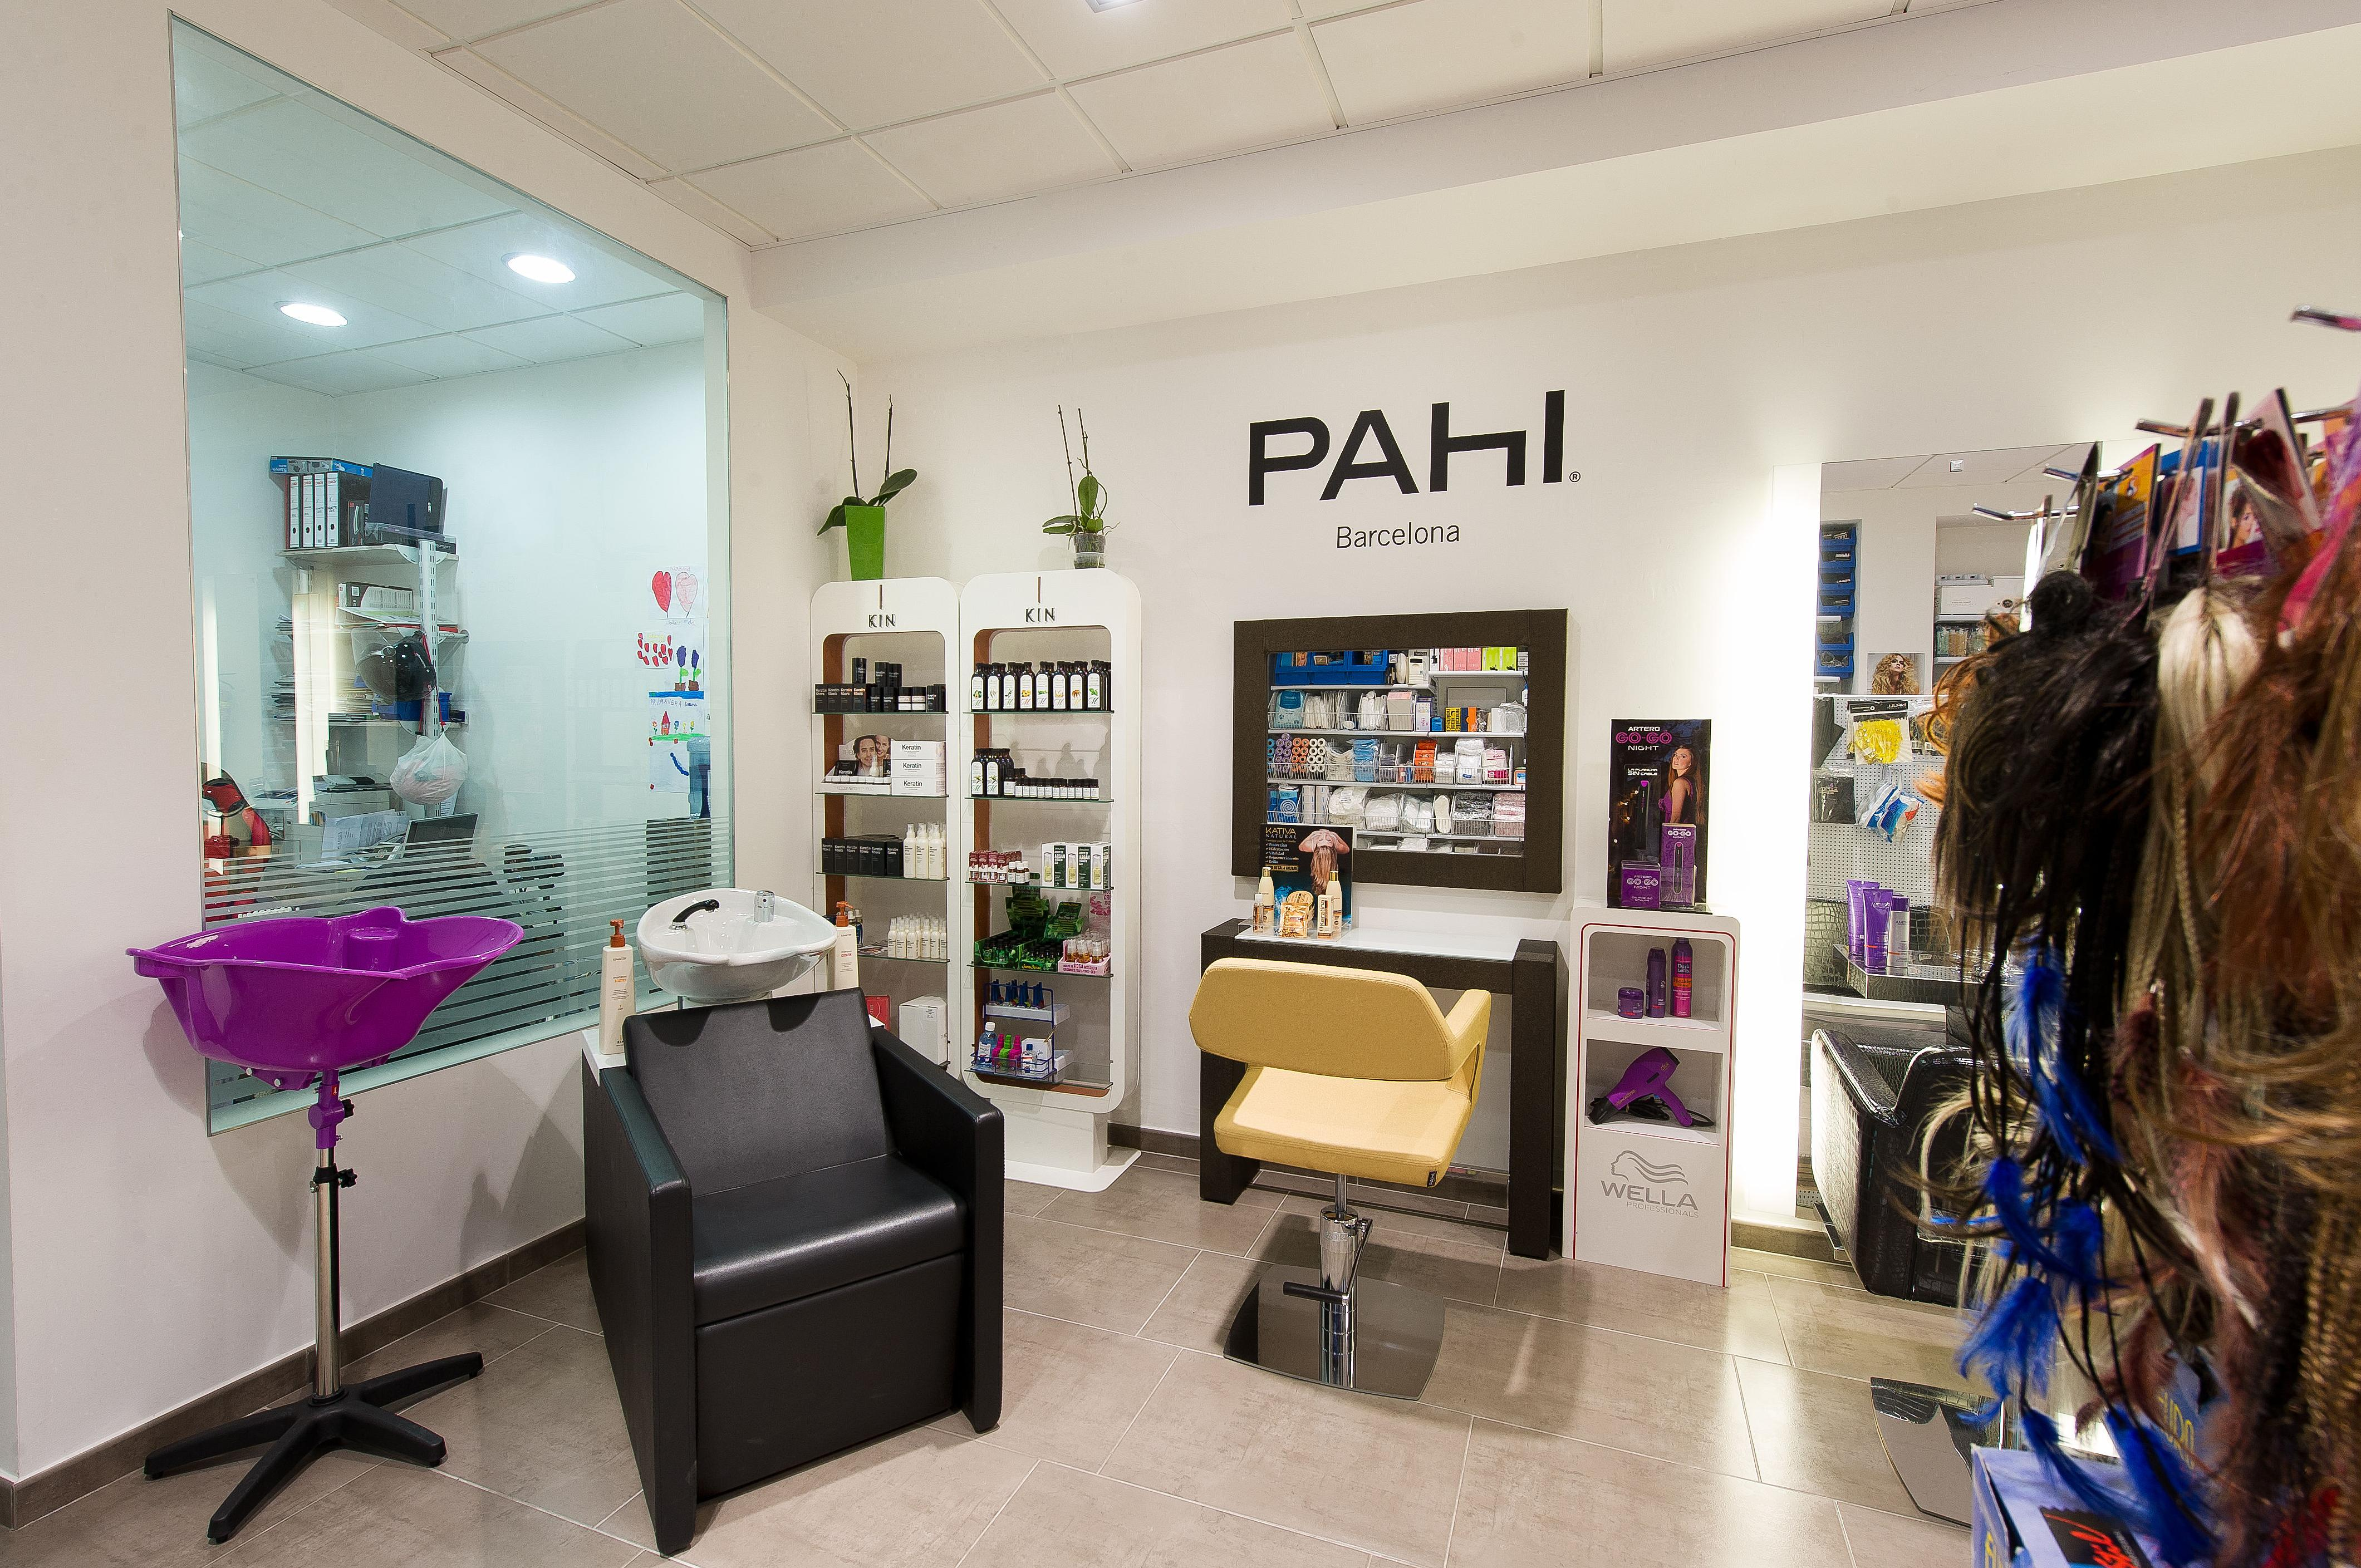 Foto 19 de Suministros para peluquerías y estética  en Ibiza | Mathiss